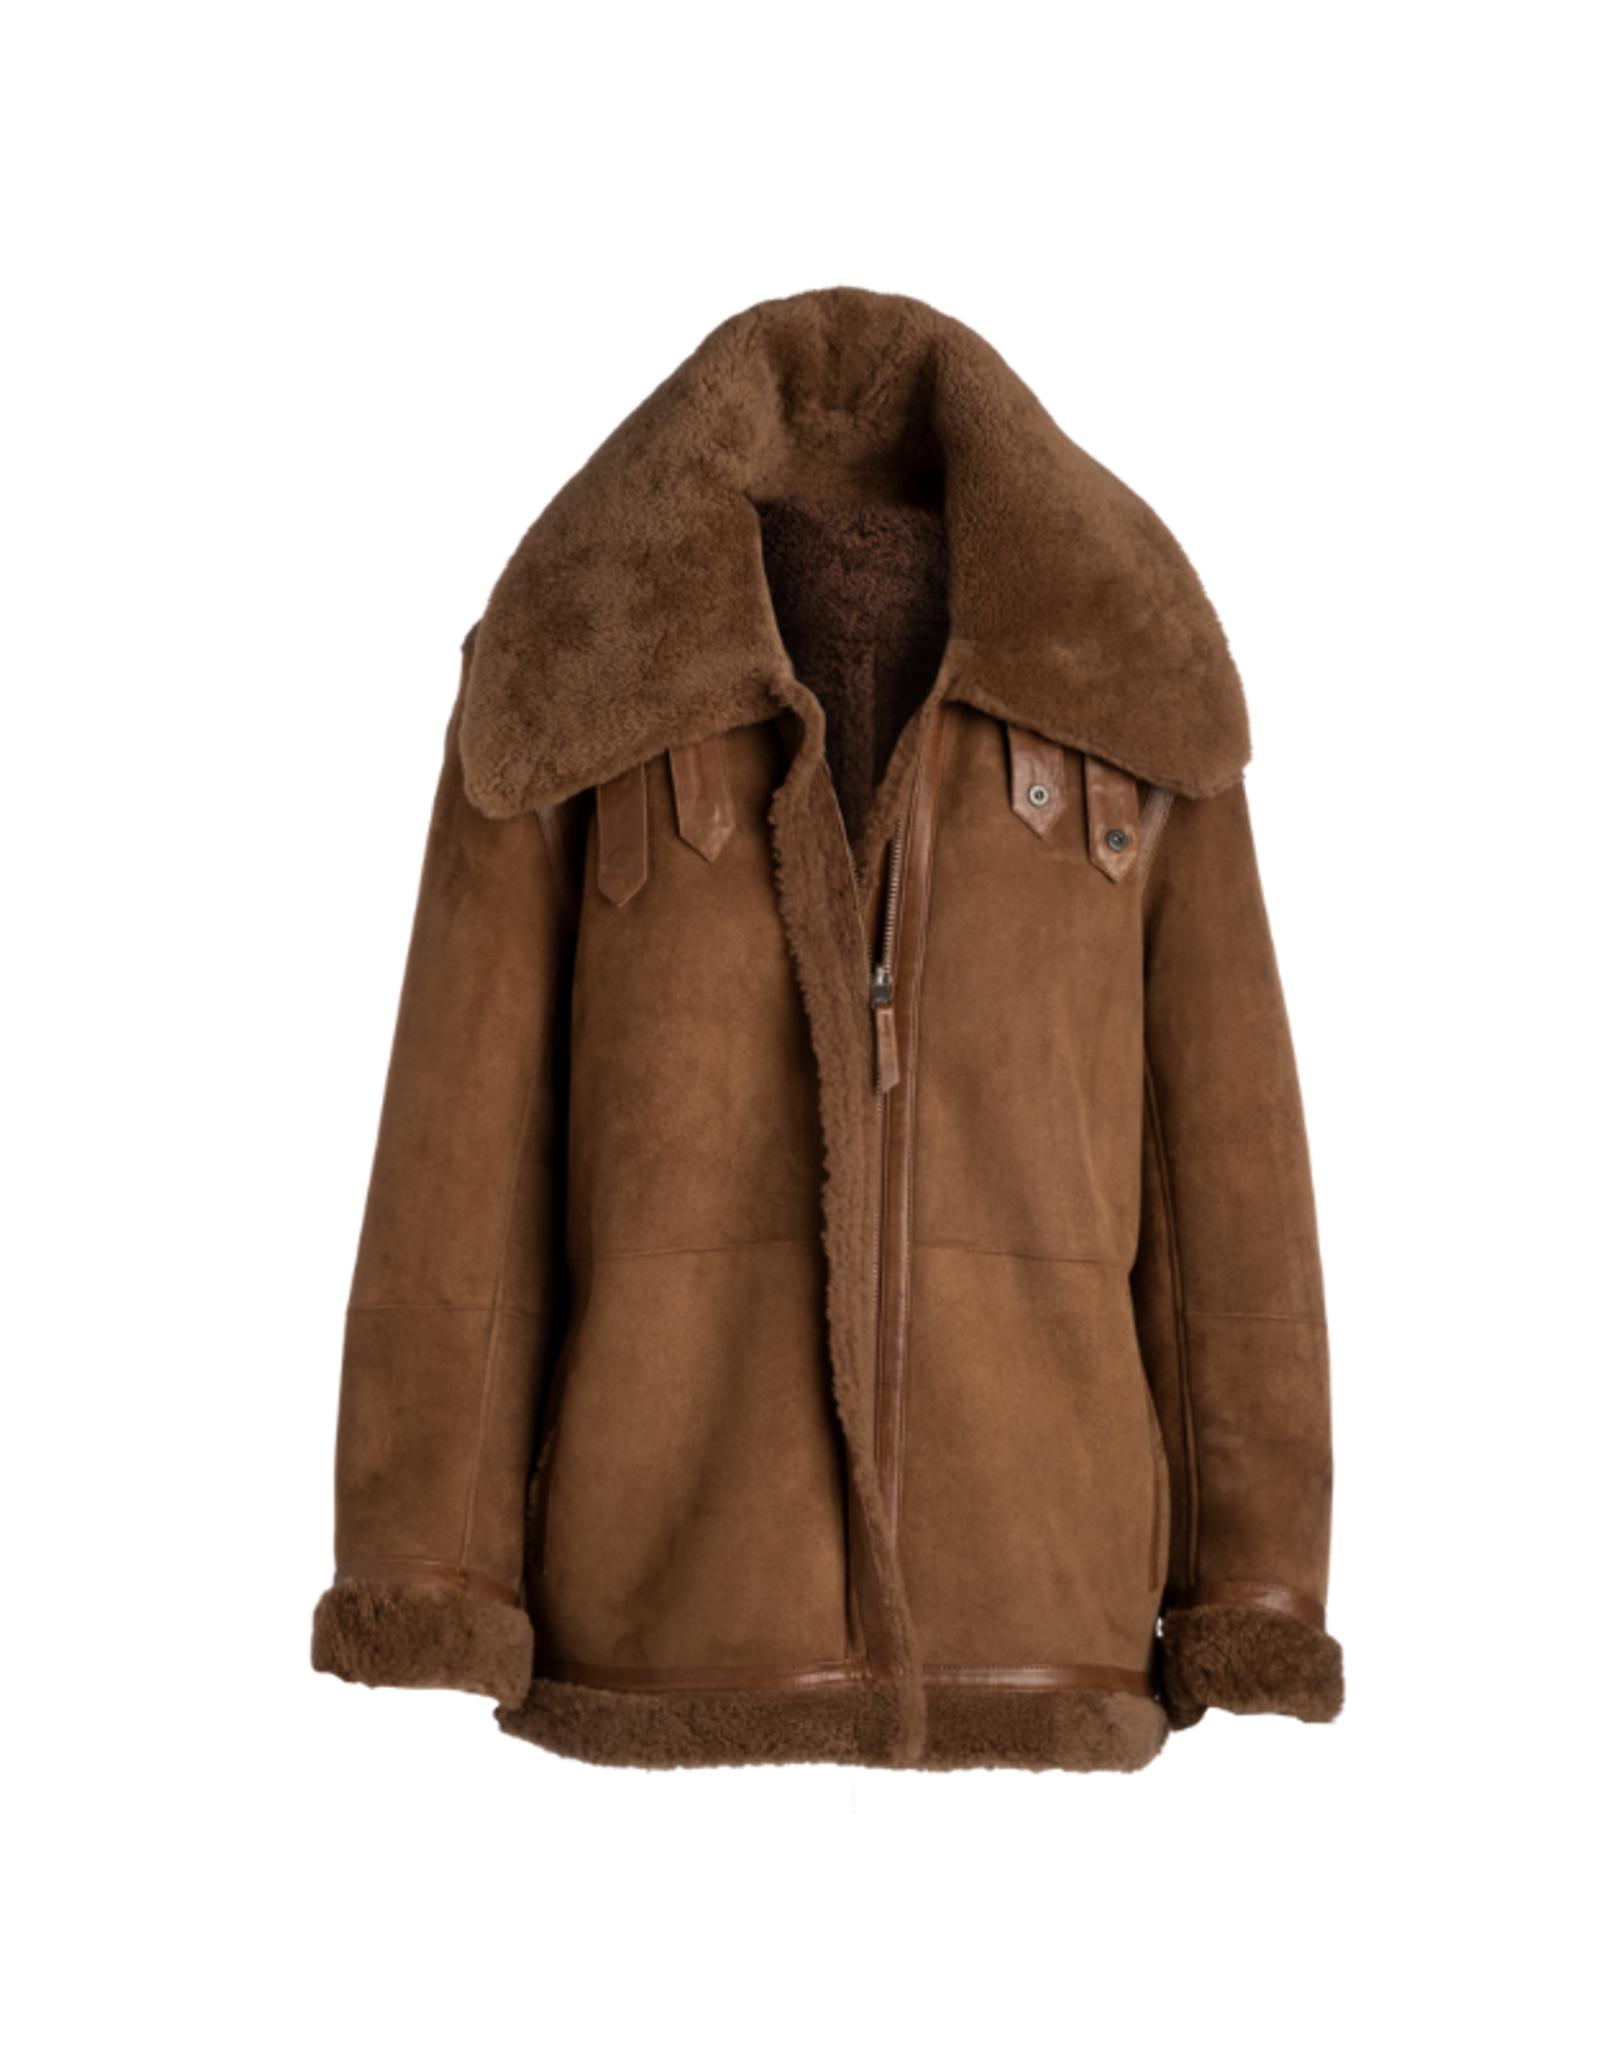 Arjé Canelle Reversible Shearling Jacket